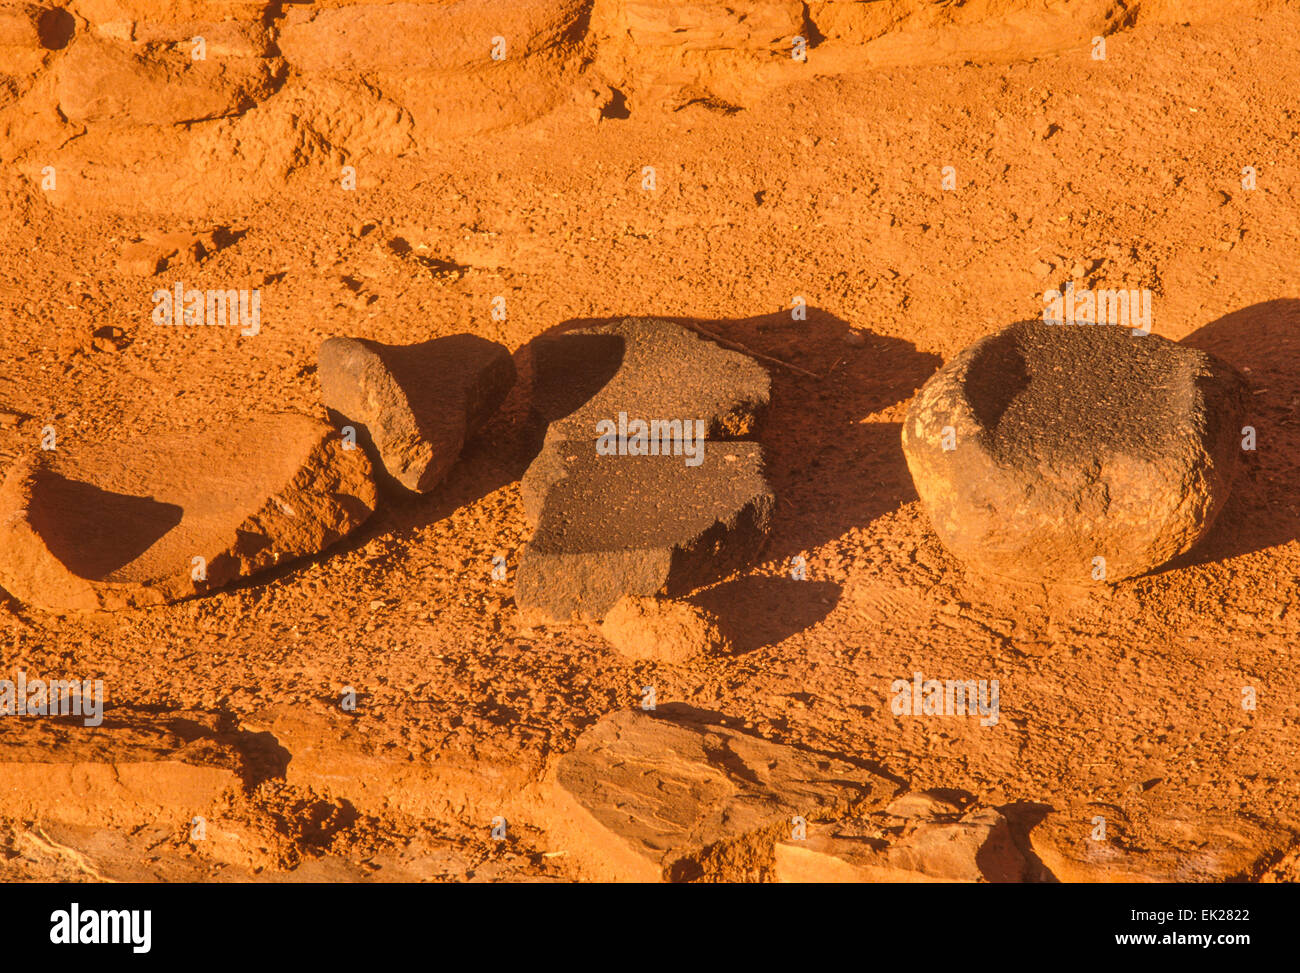 Mano e metate, Wupatki rovine Anasazi Indian, Wupatki National Monument, Arizona Immagini Stock